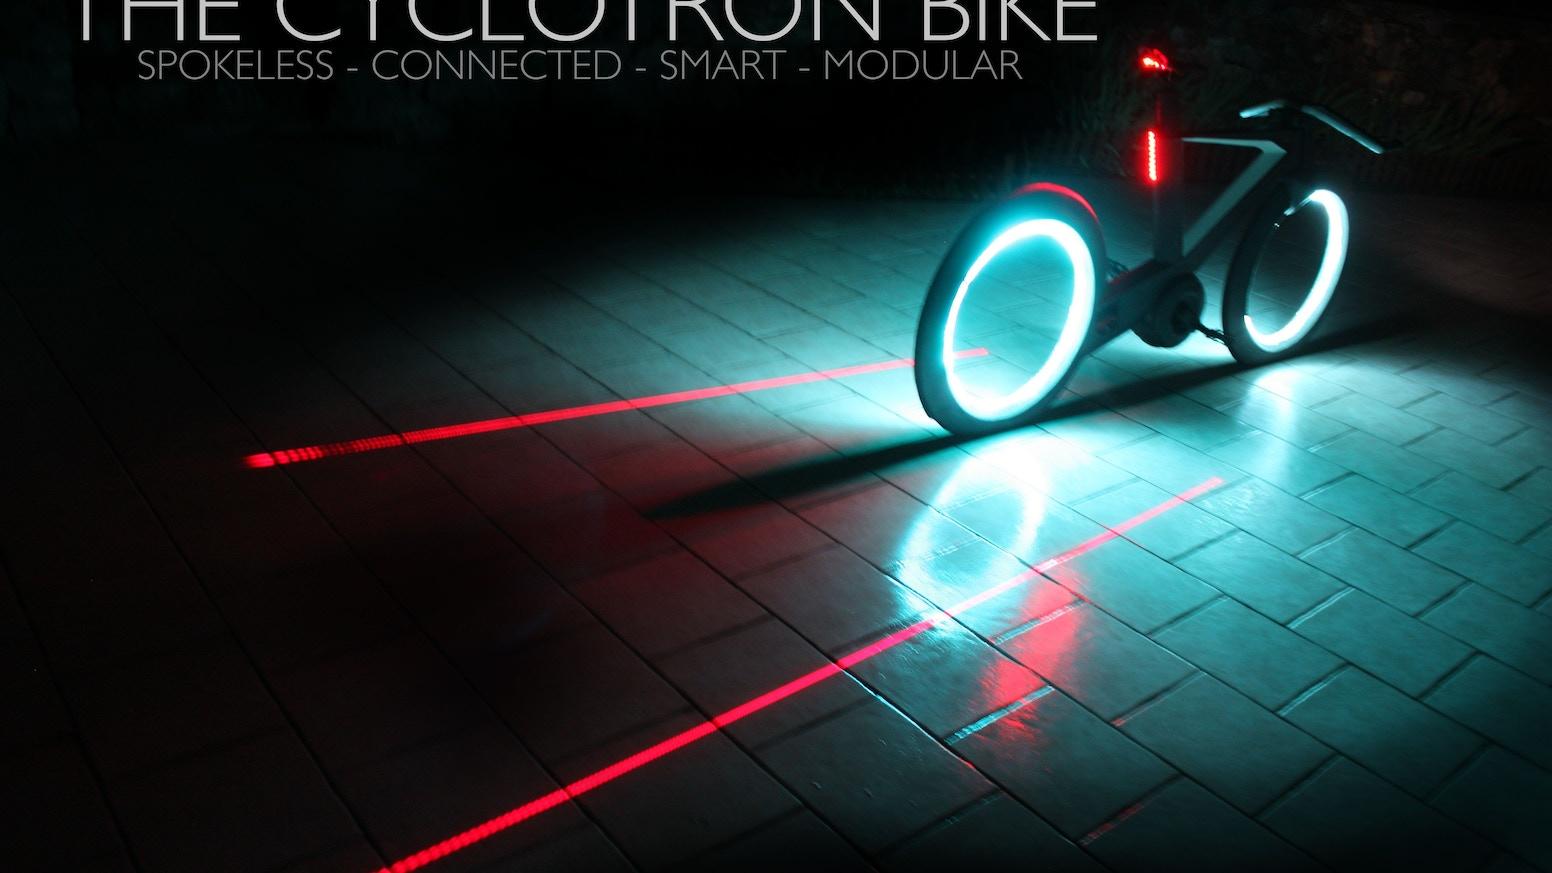 The Cyclotron Bike Revolutionary Spokeless Smart Cycle